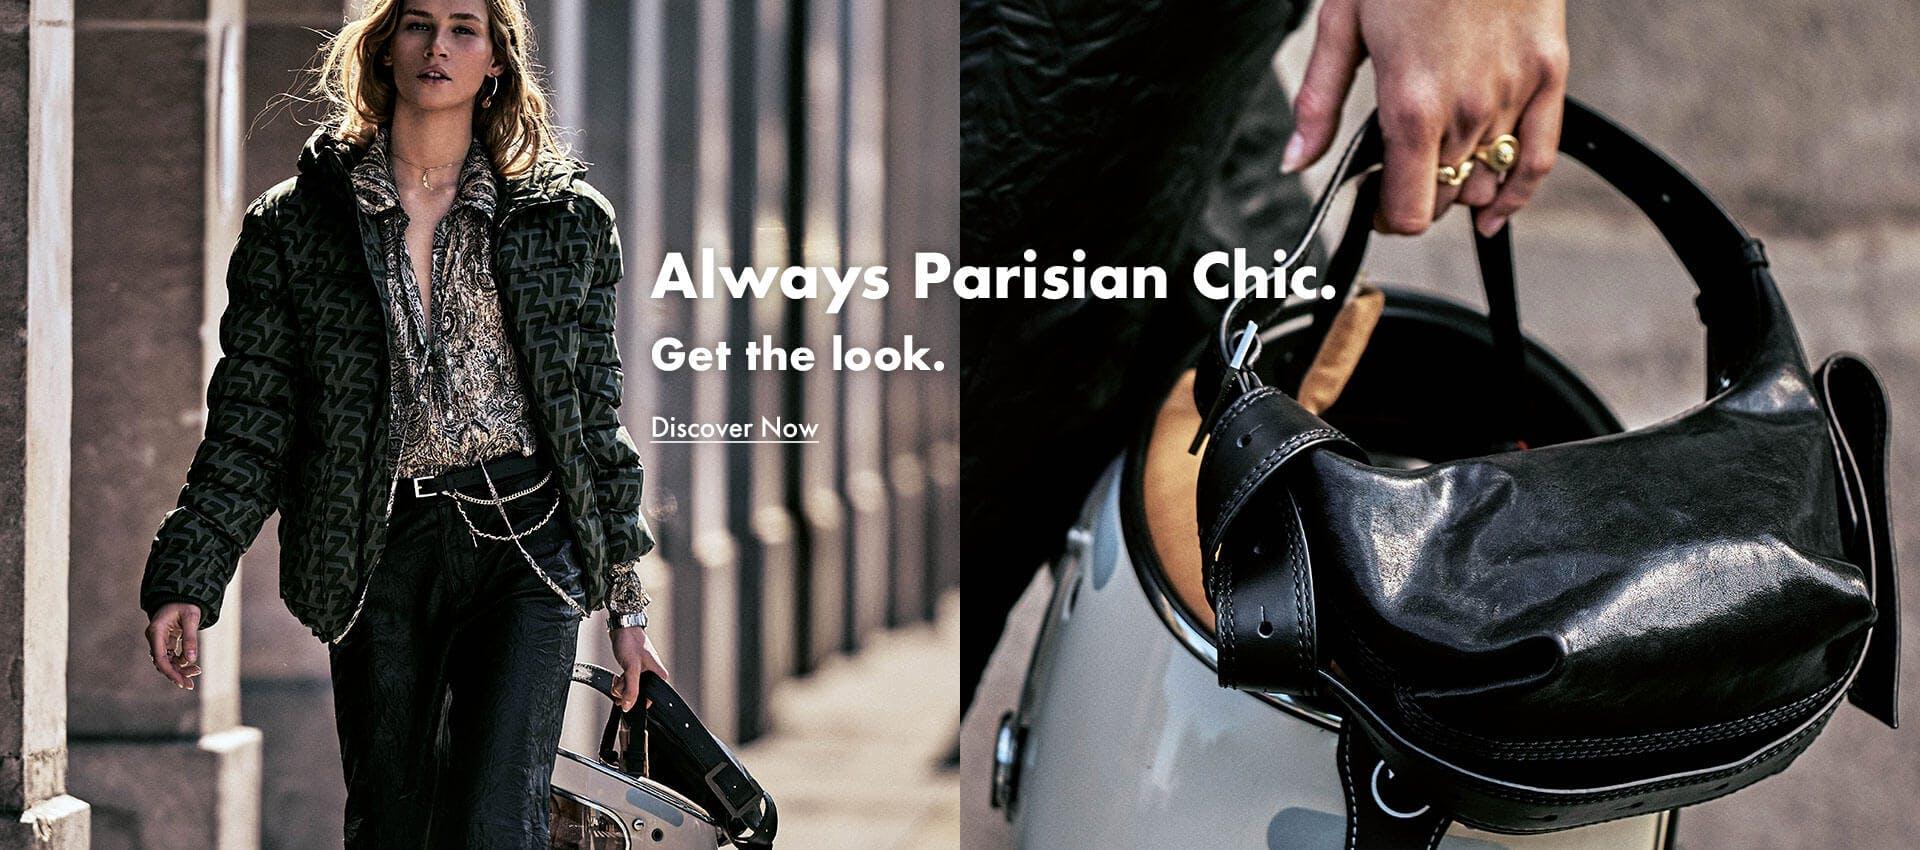 Parisian Chic September 2021